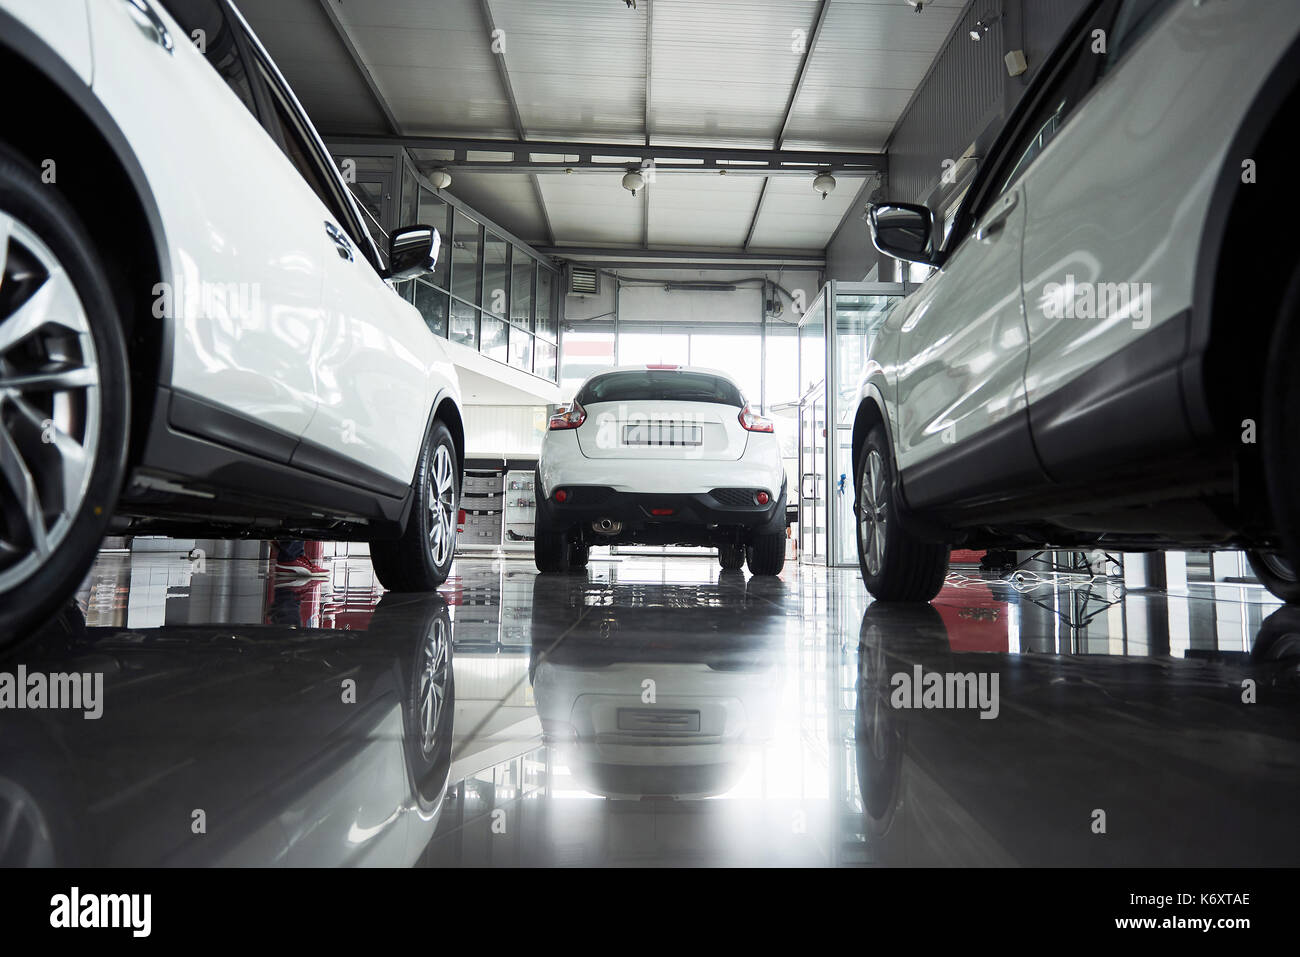 Car sales, marketplace, shot at wide angle Stock Photo, Royalty ...